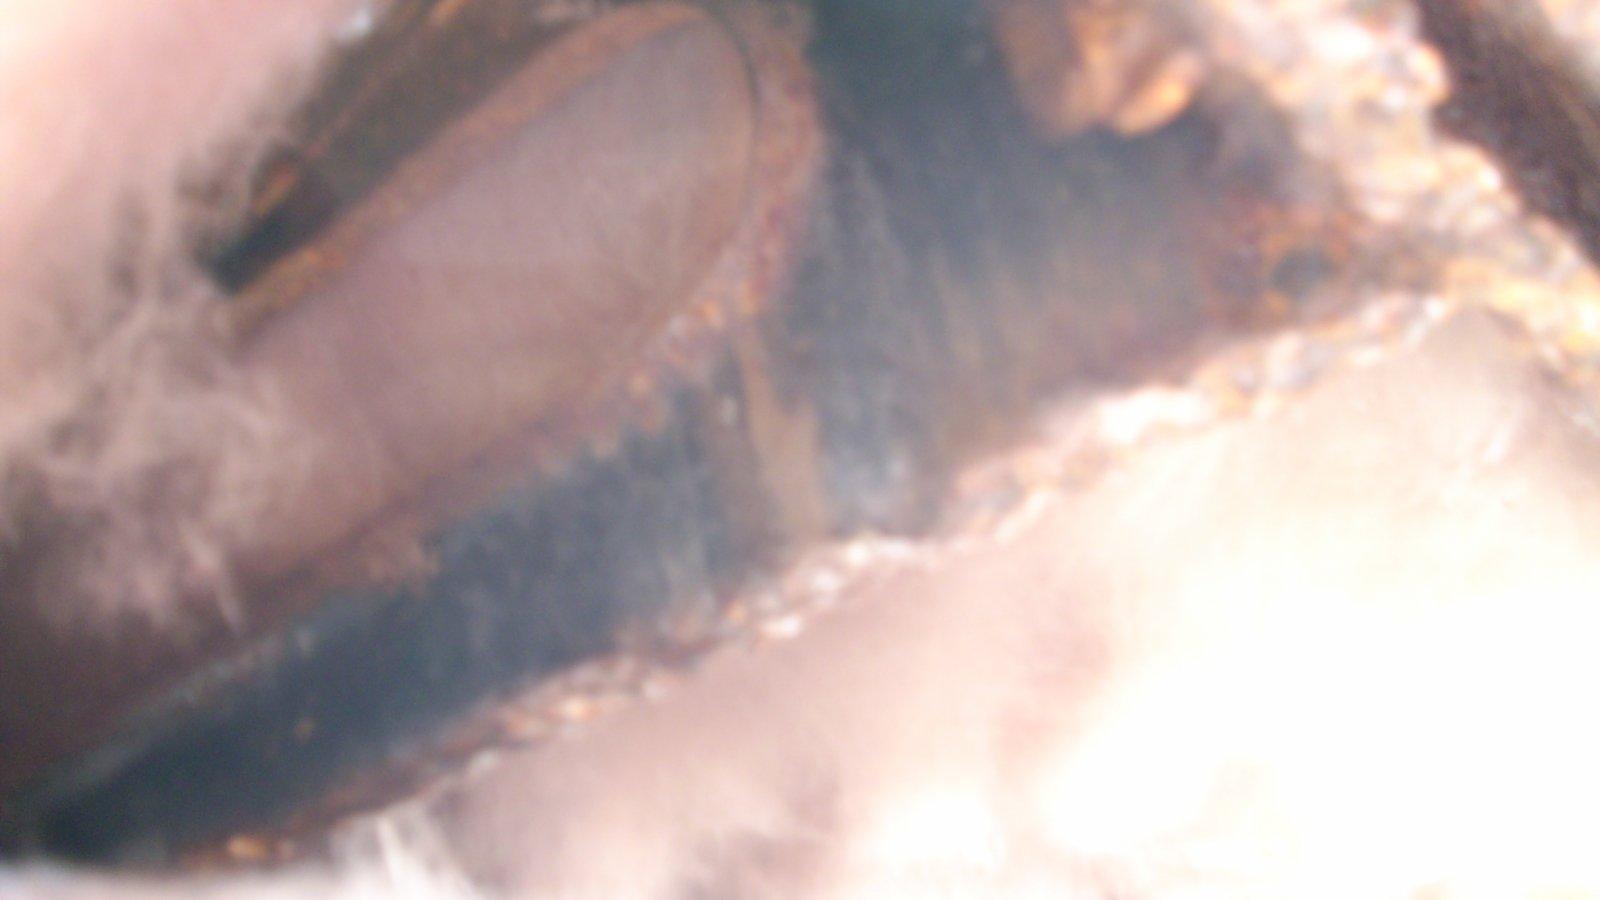 Click image for larger version  Name:frame damage 006.jpg Views:93 Size:88.4 KB ID:69080